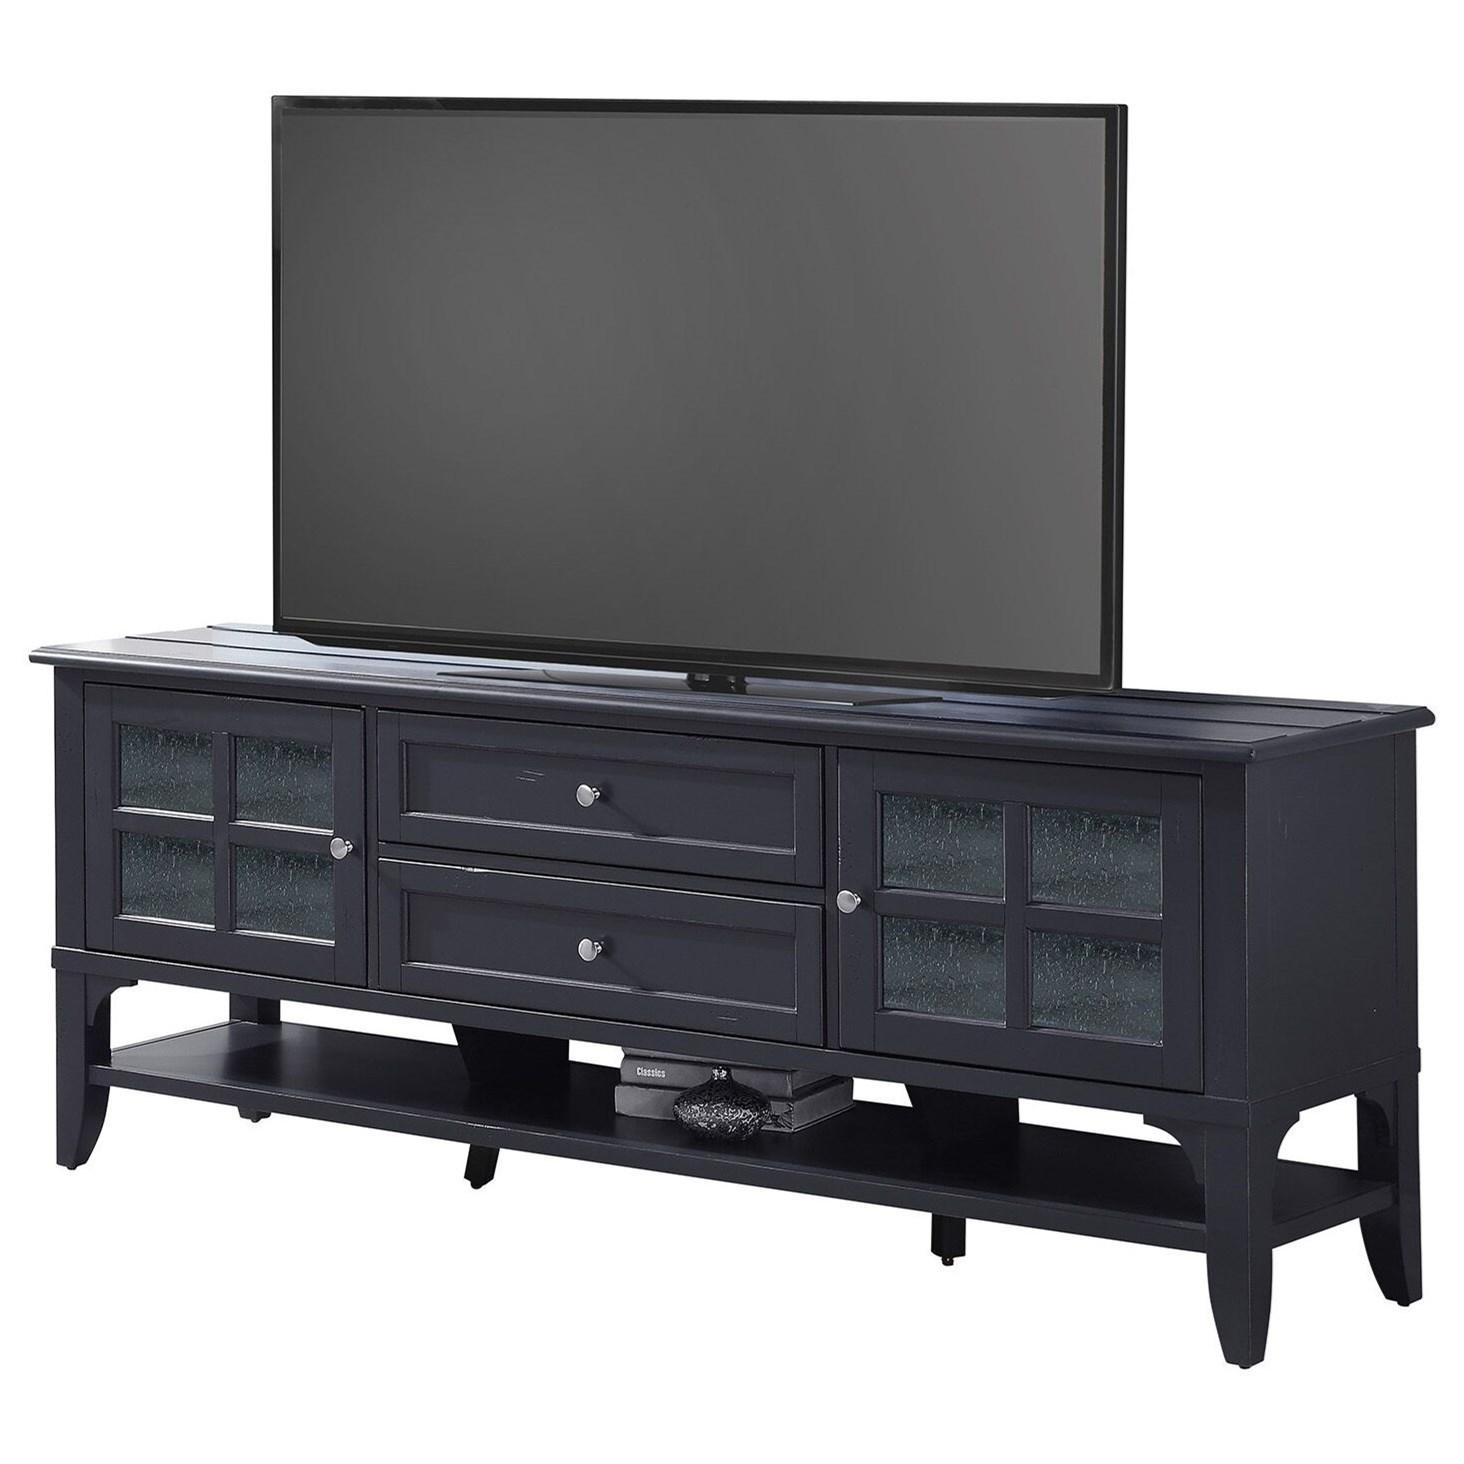 76 in. TV Console